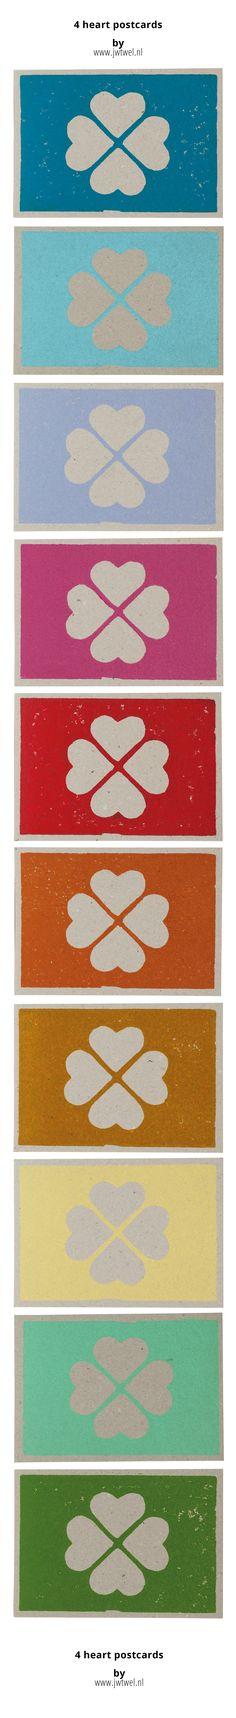 jwtwel, 4 heart linoprint postcard on grayboard paper. © jwtwel 2015 Fresh New Summer Colours #lino #postcard #4heart #love #graphic #art #lovelycard #linoleum #jwtwel #blue #lightblue #lila #pink #red #orange #darkyellow #lightyellow #mint #green #handcraft #hartje4 #summer #colorplan